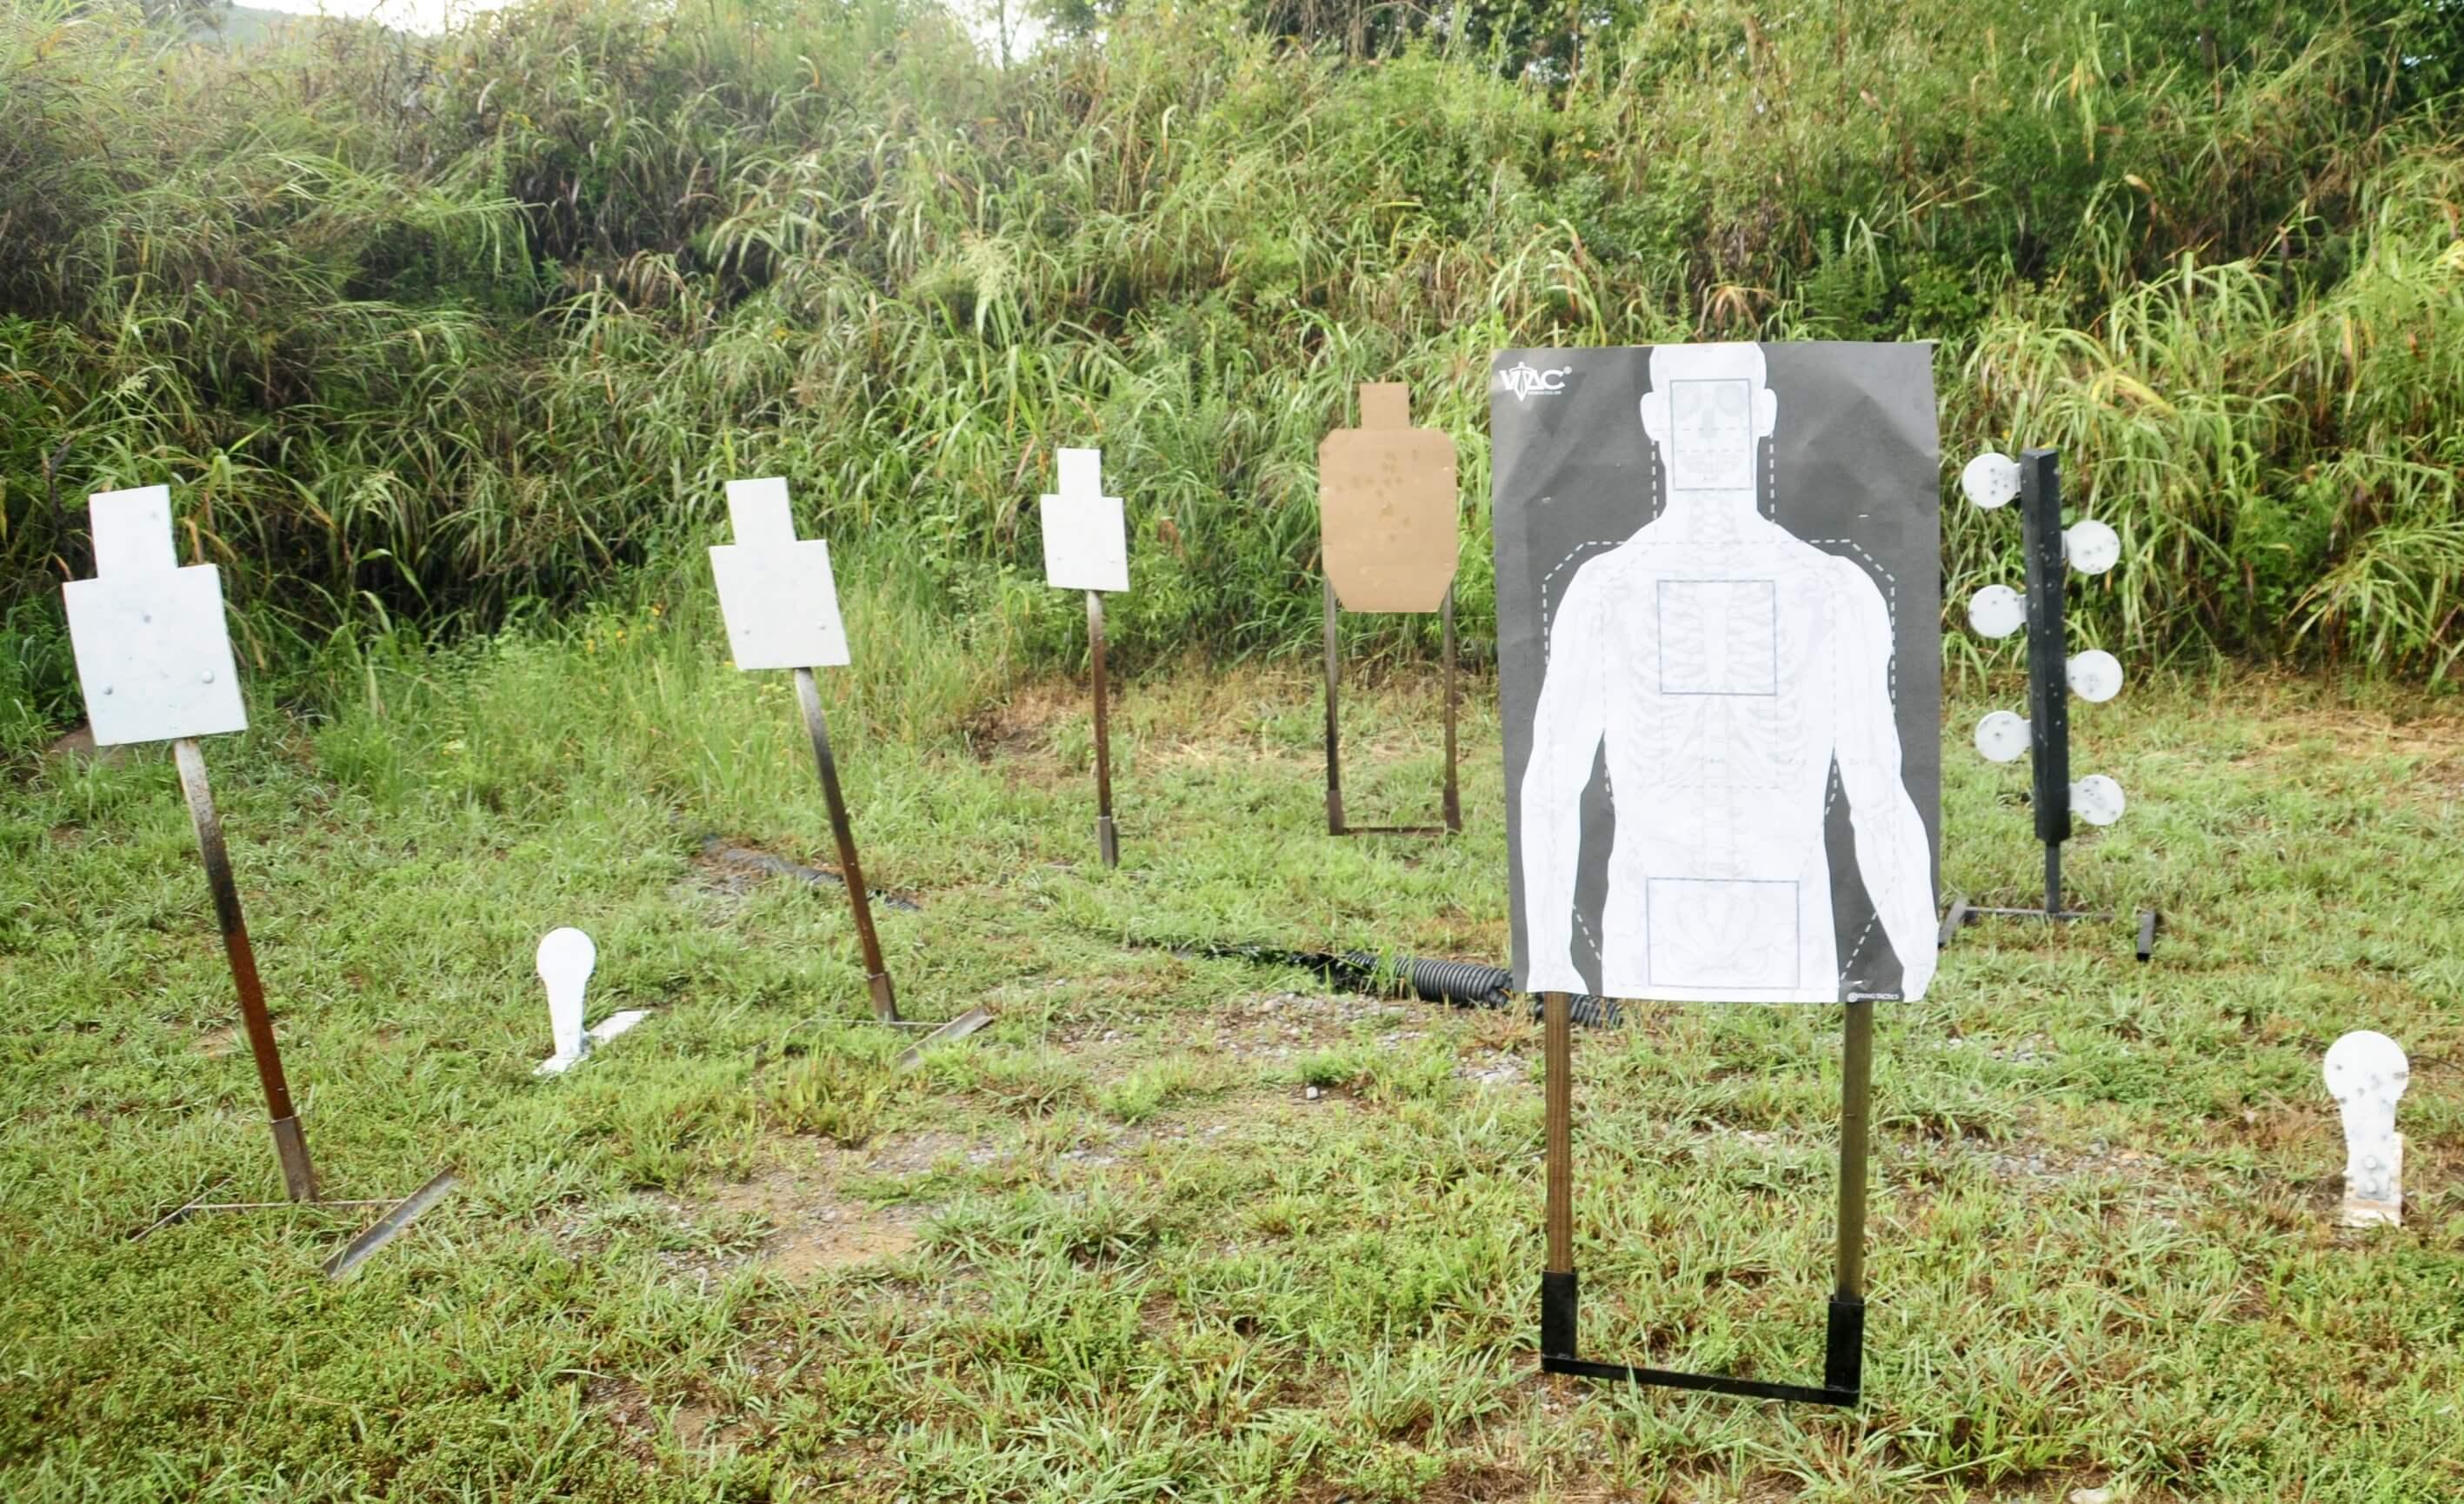 Jeff's Five Favorite Targets